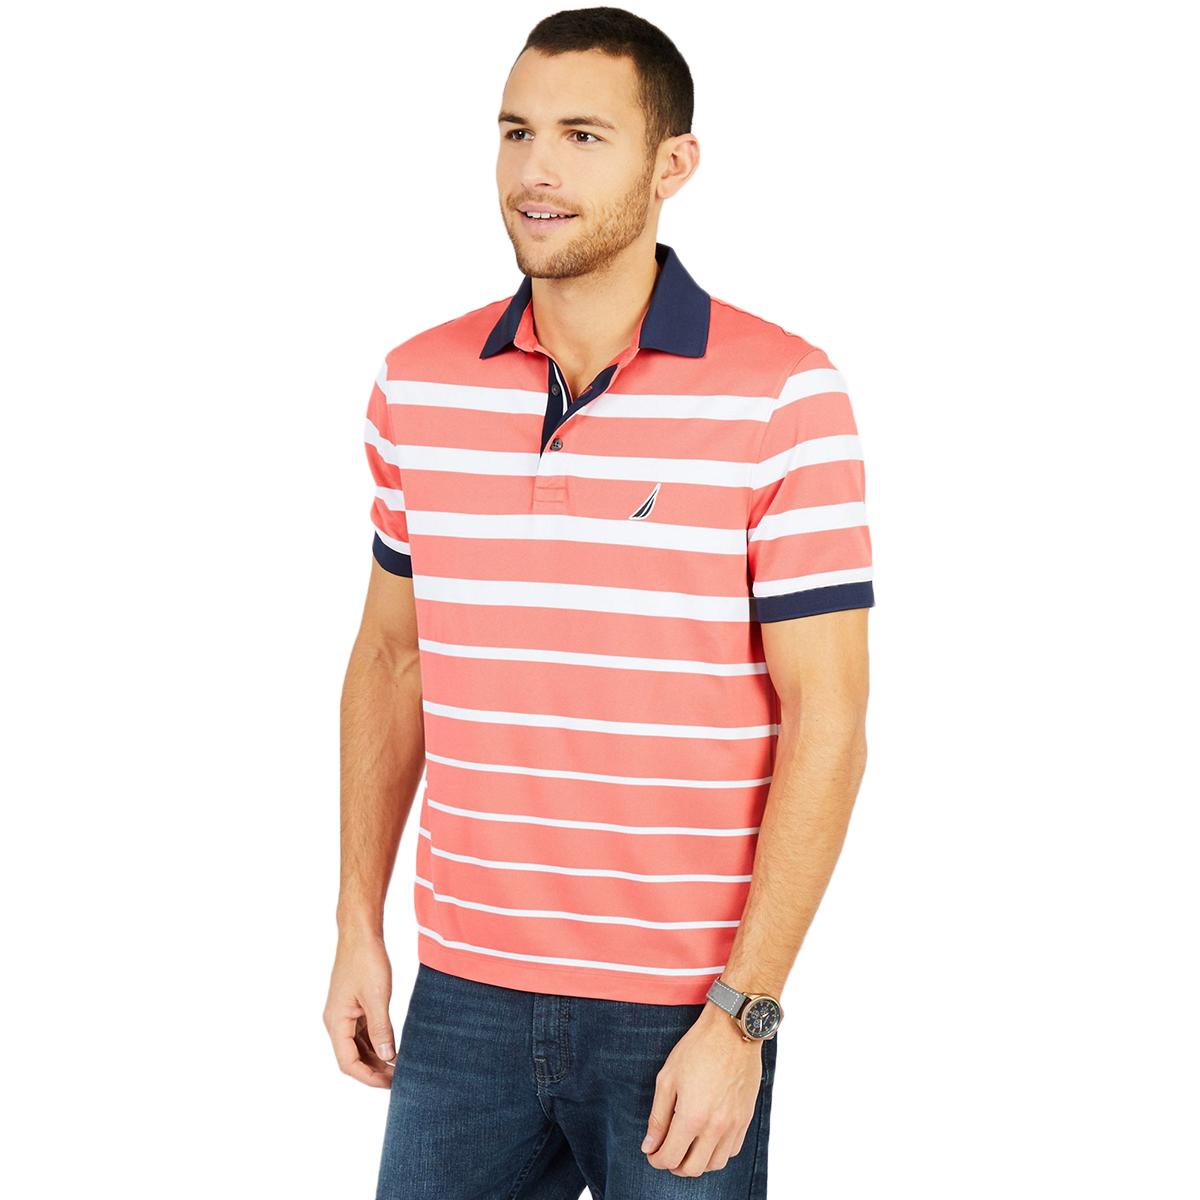 Nautica Men's Striped Performance Polo Shirt - Orange, XL